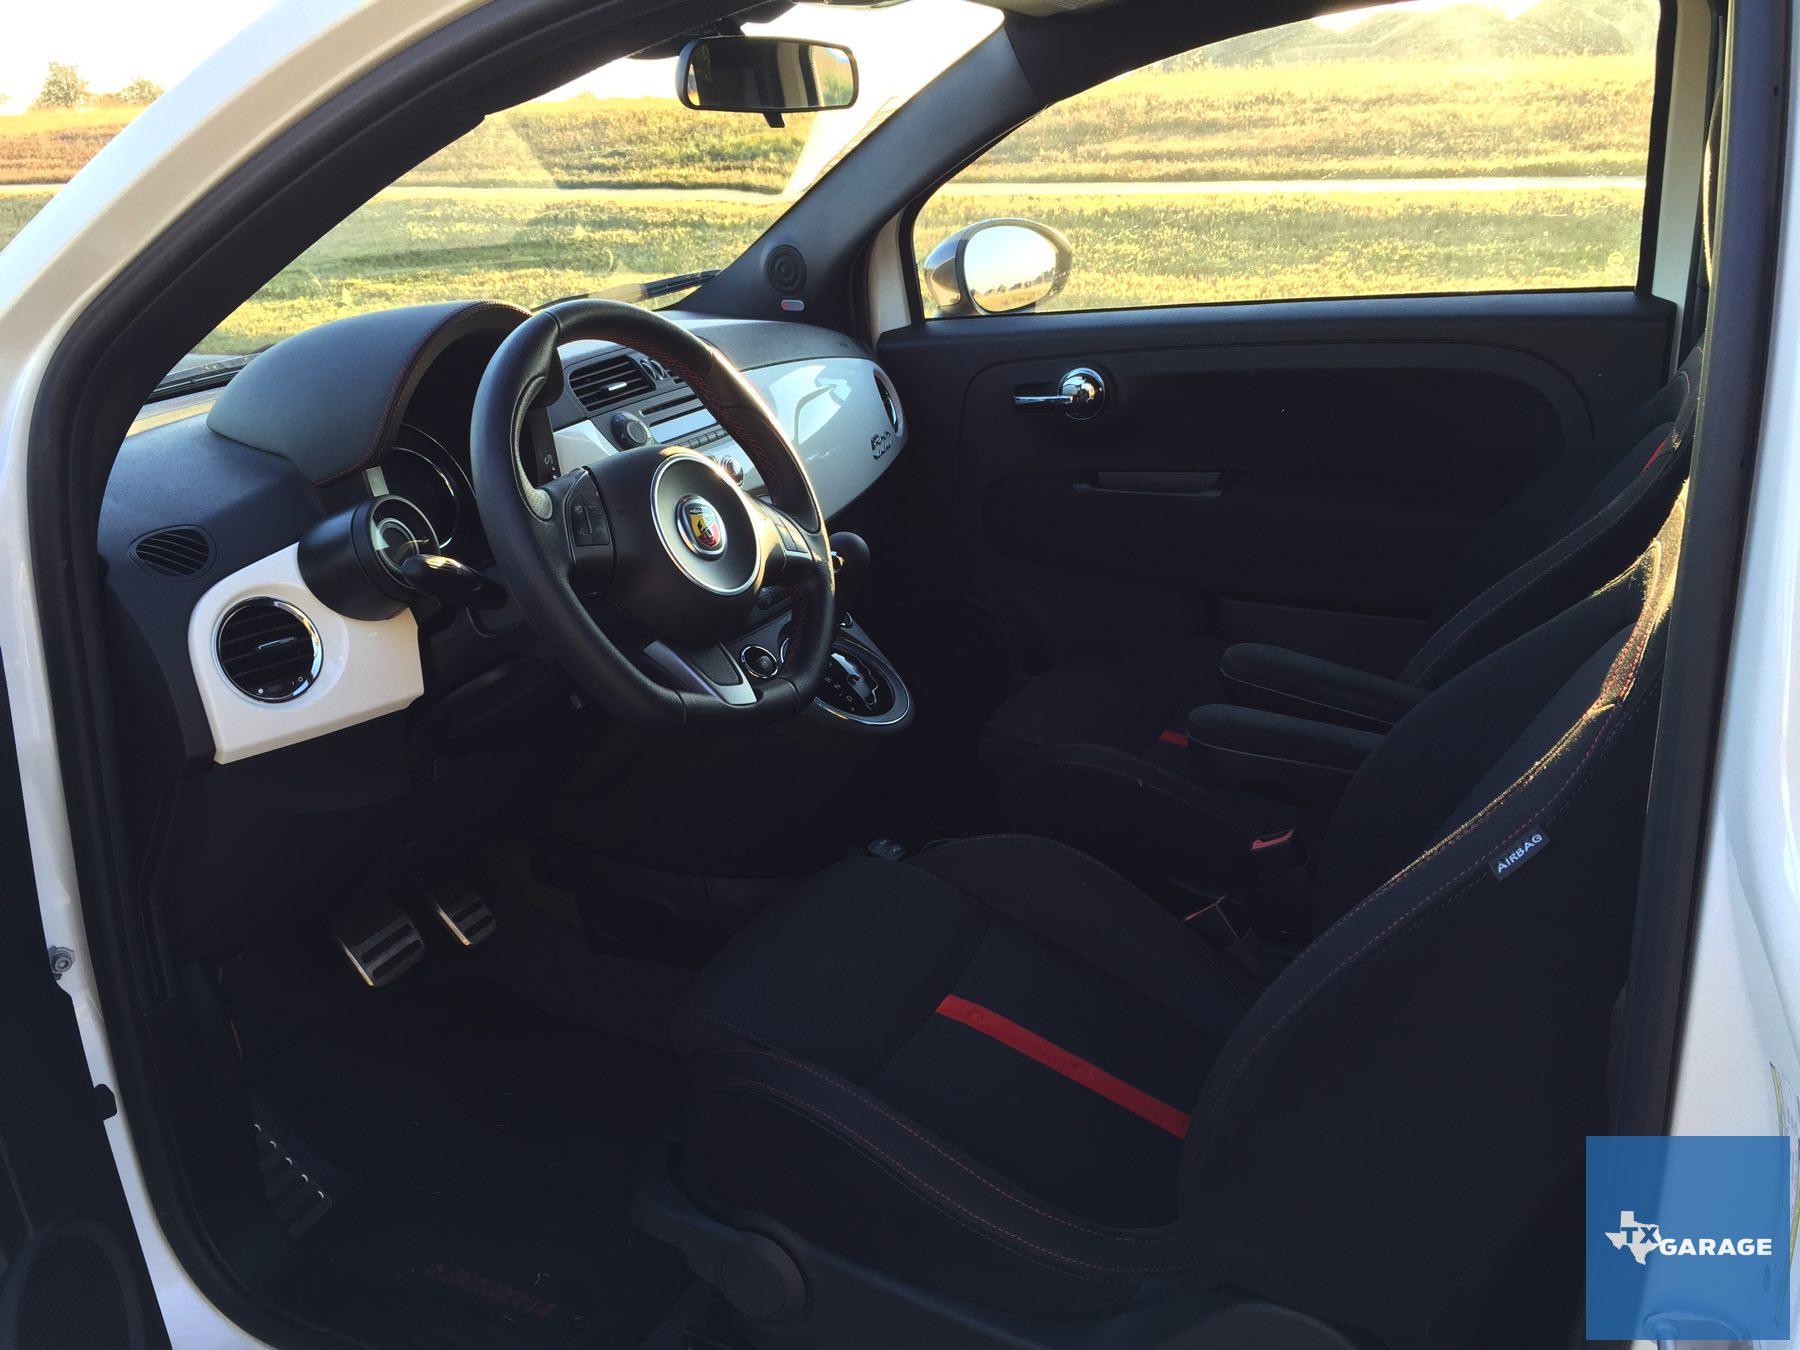 2015-Fiat-500-Abarth-txGarage-049